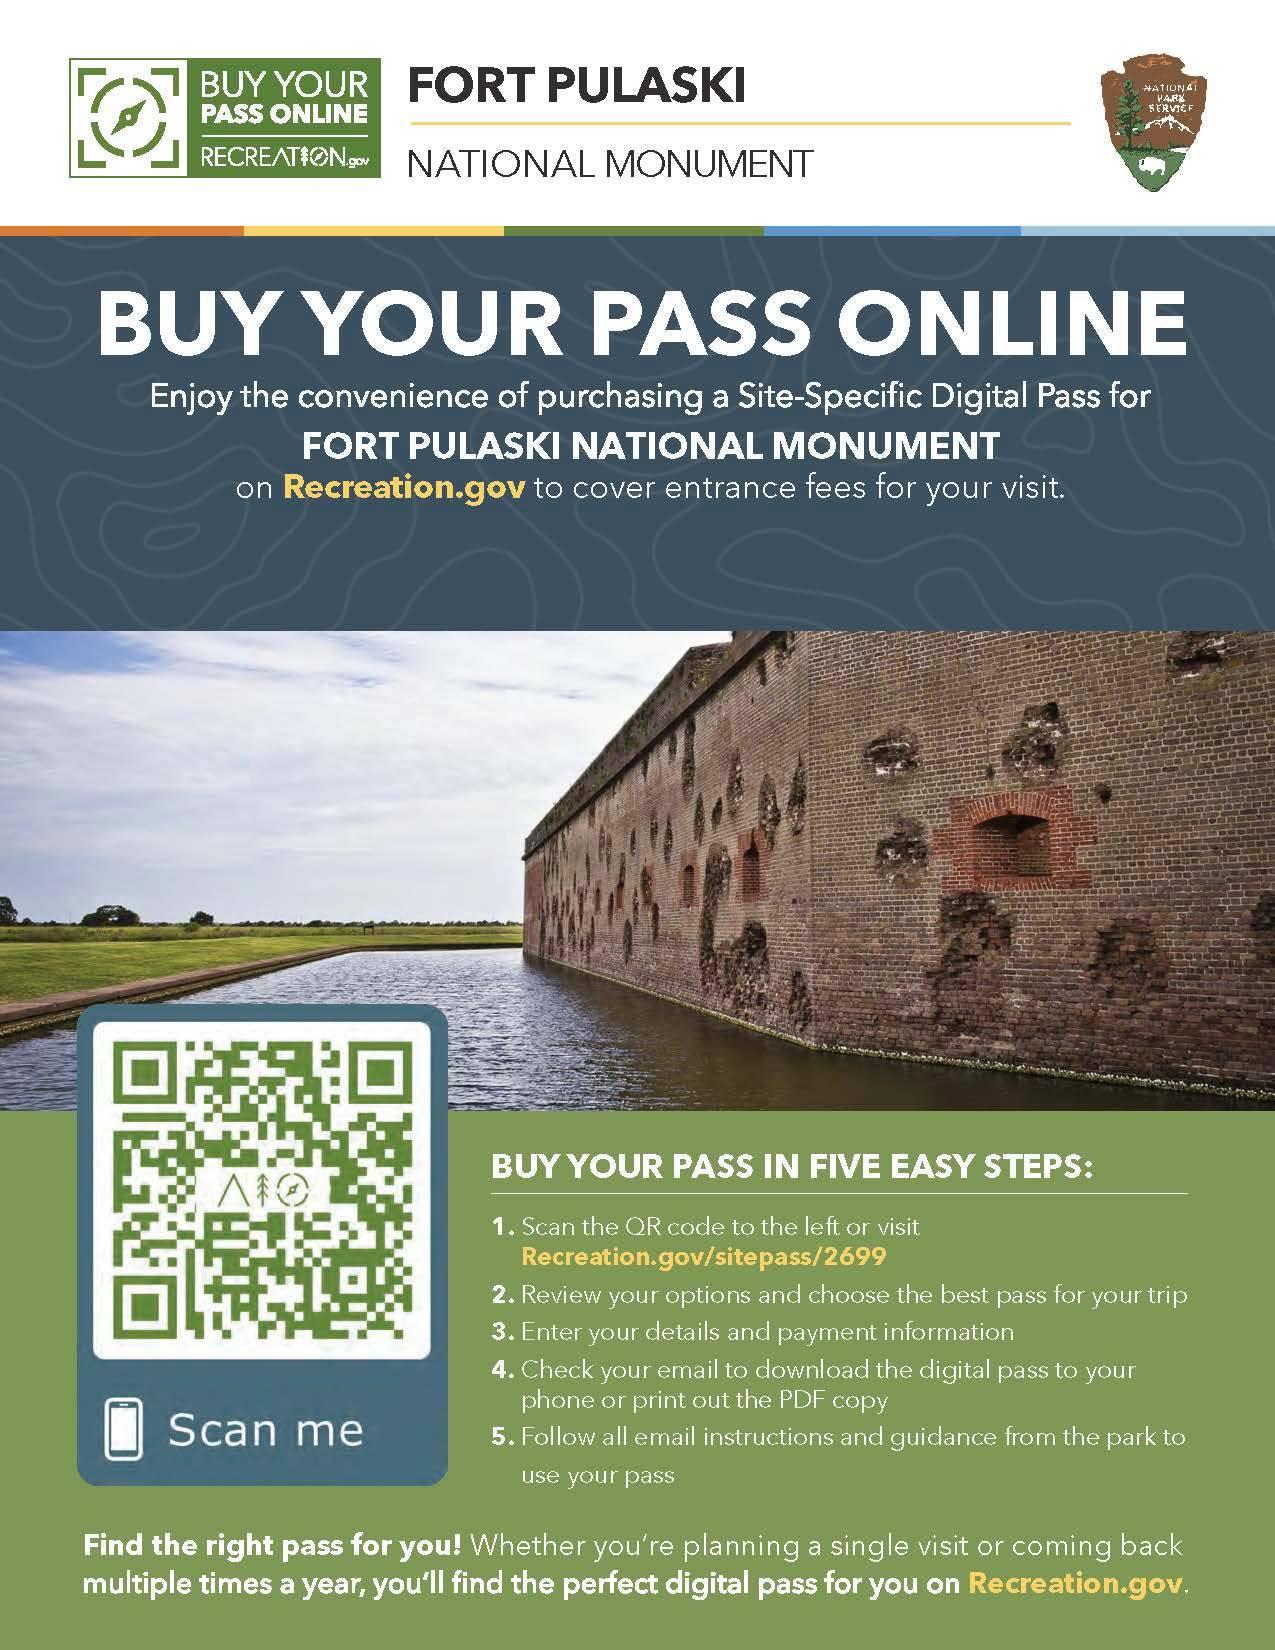 Fort Pulaski National Monument TYbee Savannah